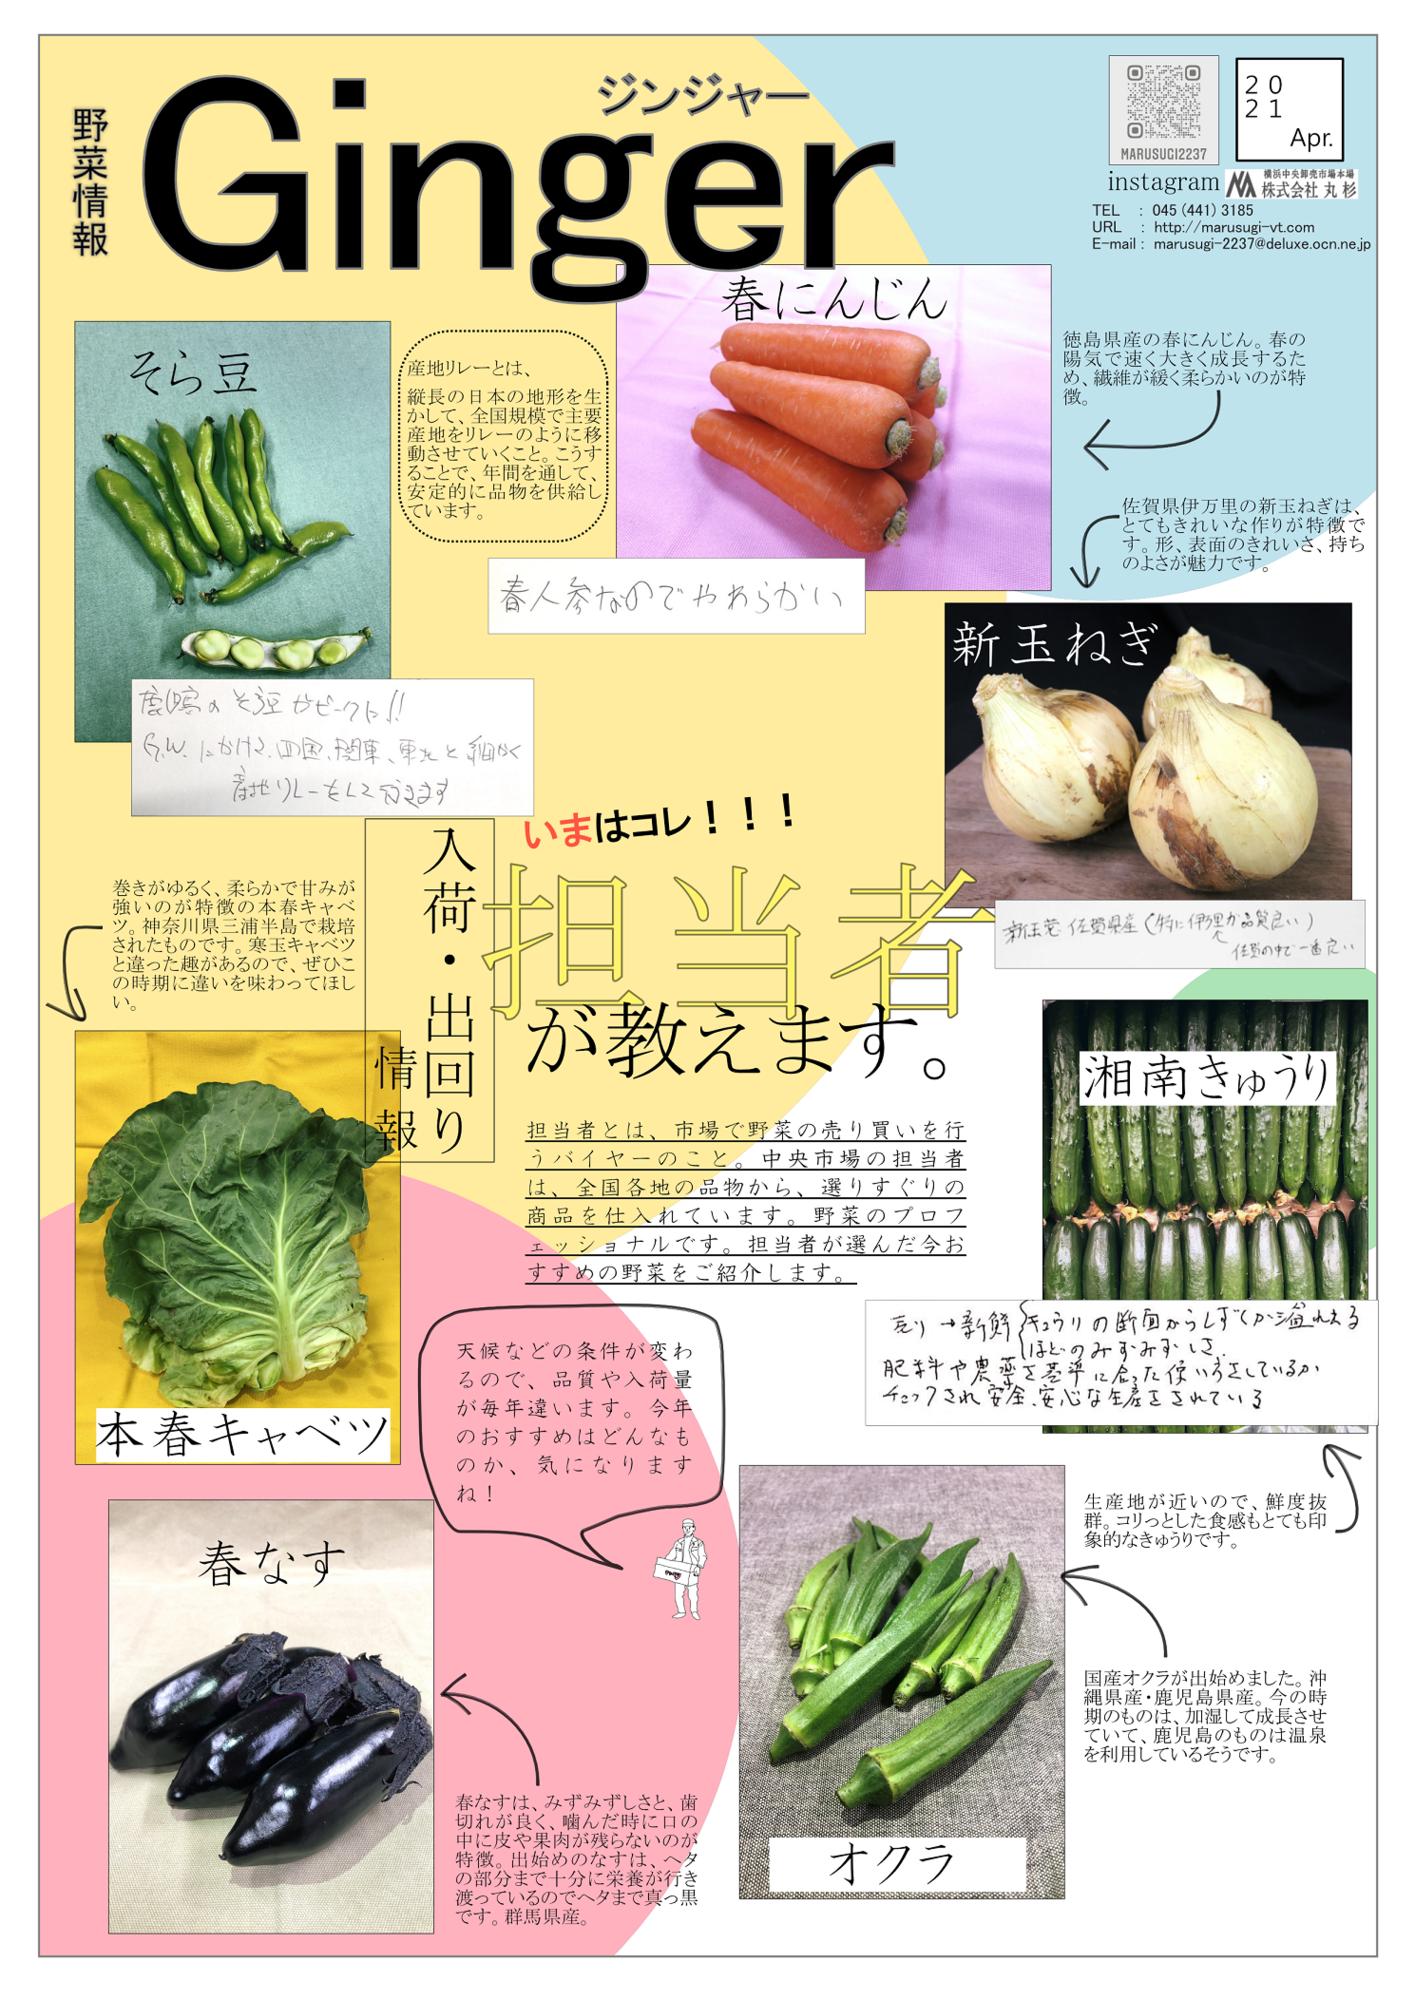 f:id:marusugi-2237:20210402100310p:plain